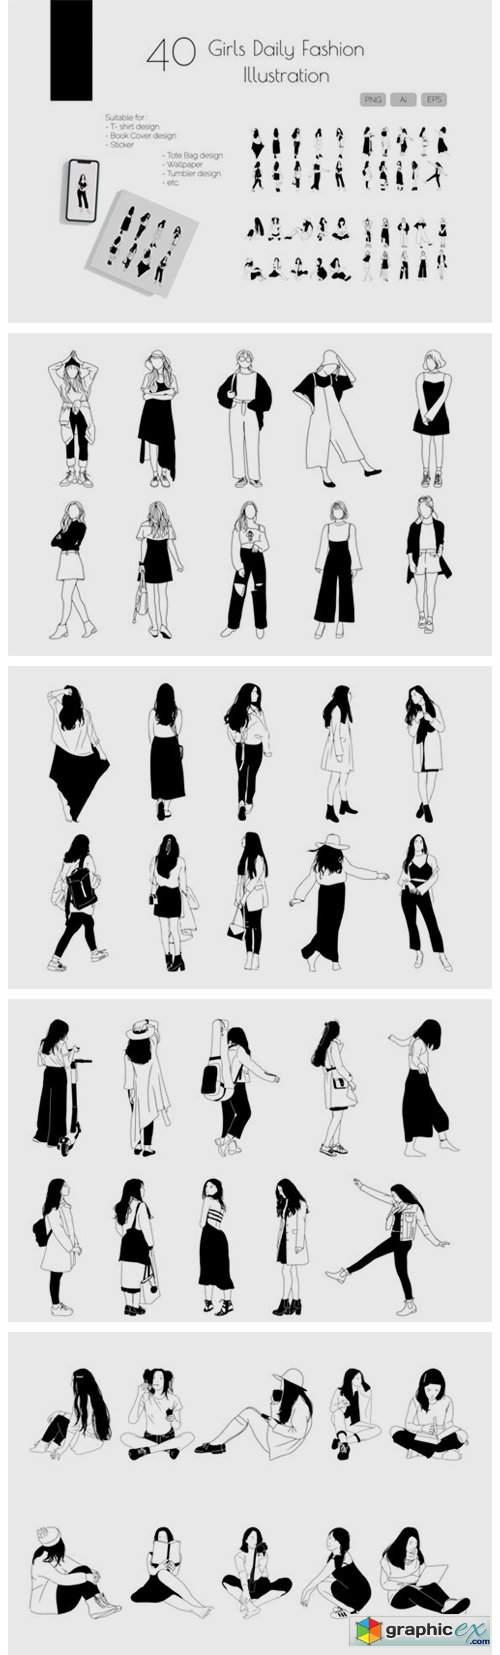 Girls Daily Fashion Illustration